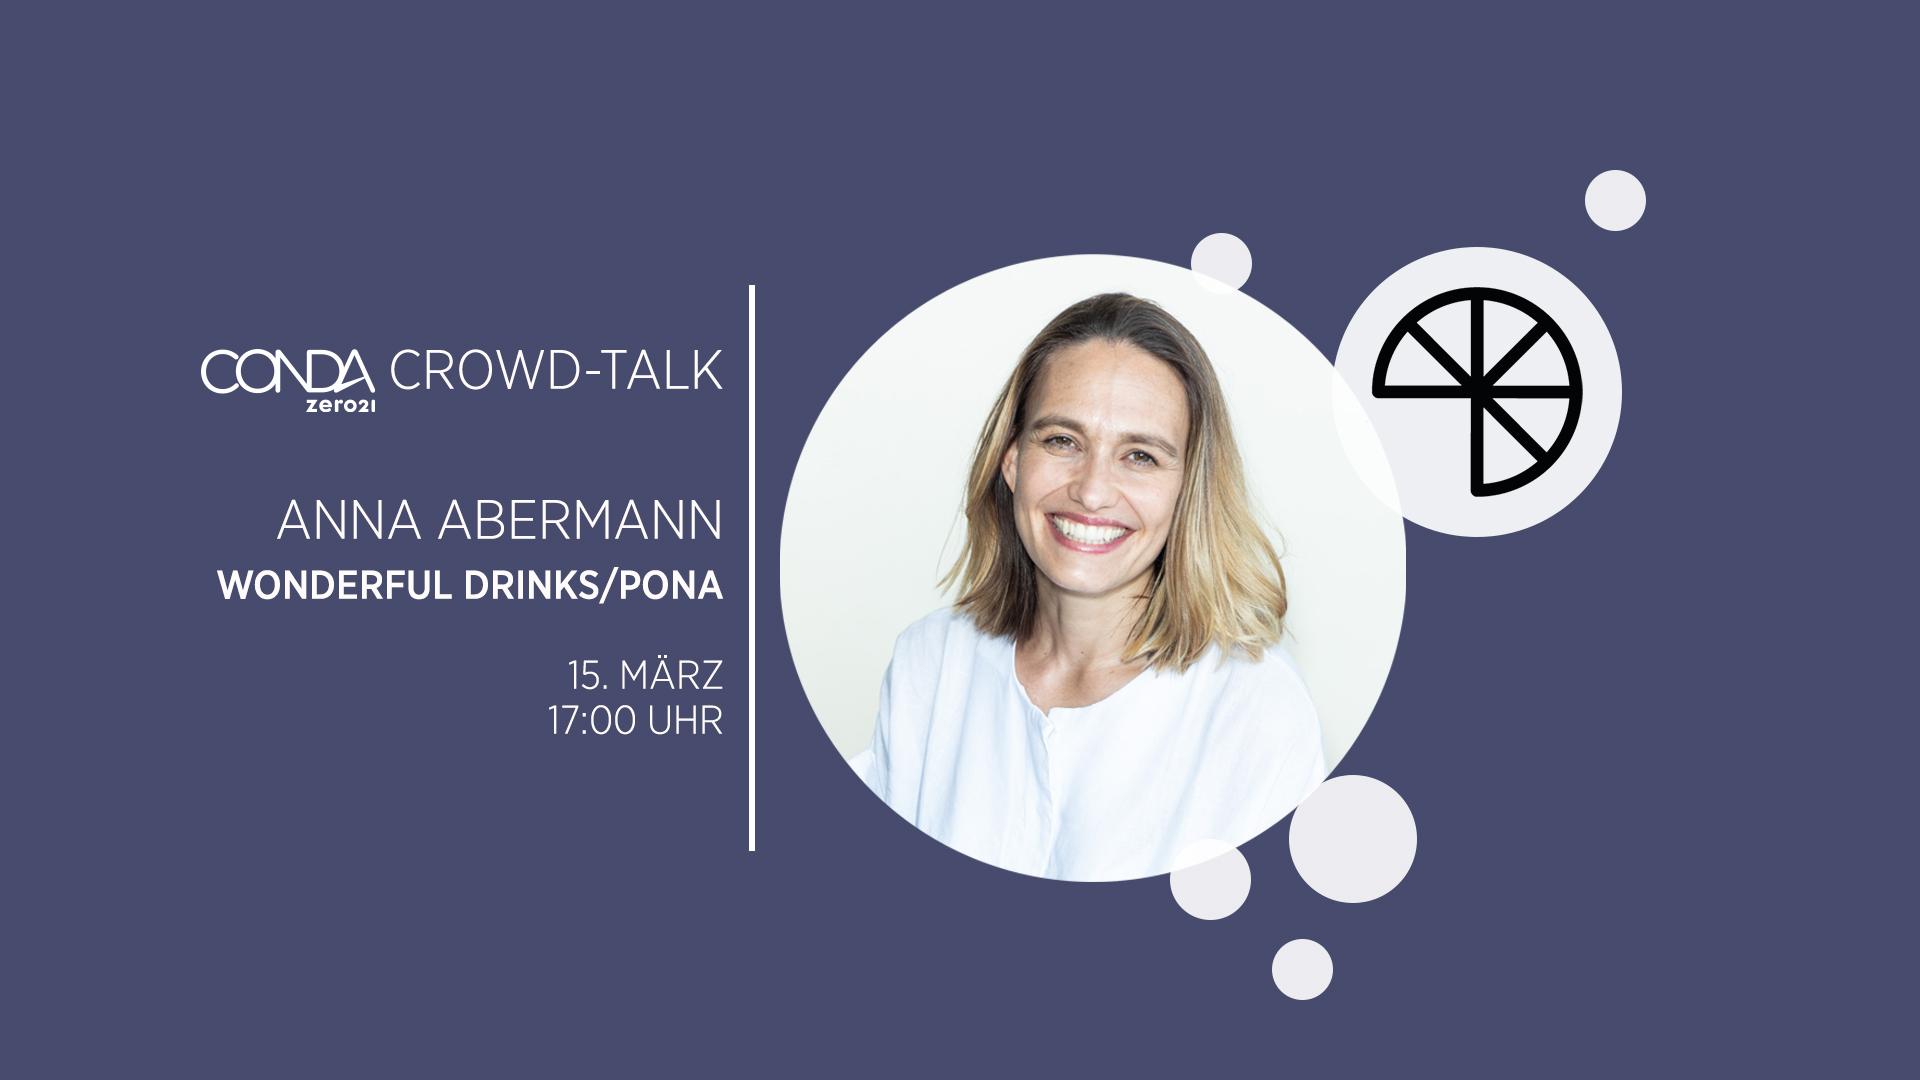 Wonderful Drinks / PONA - Crowd Talk Anna Abermann - CONDA